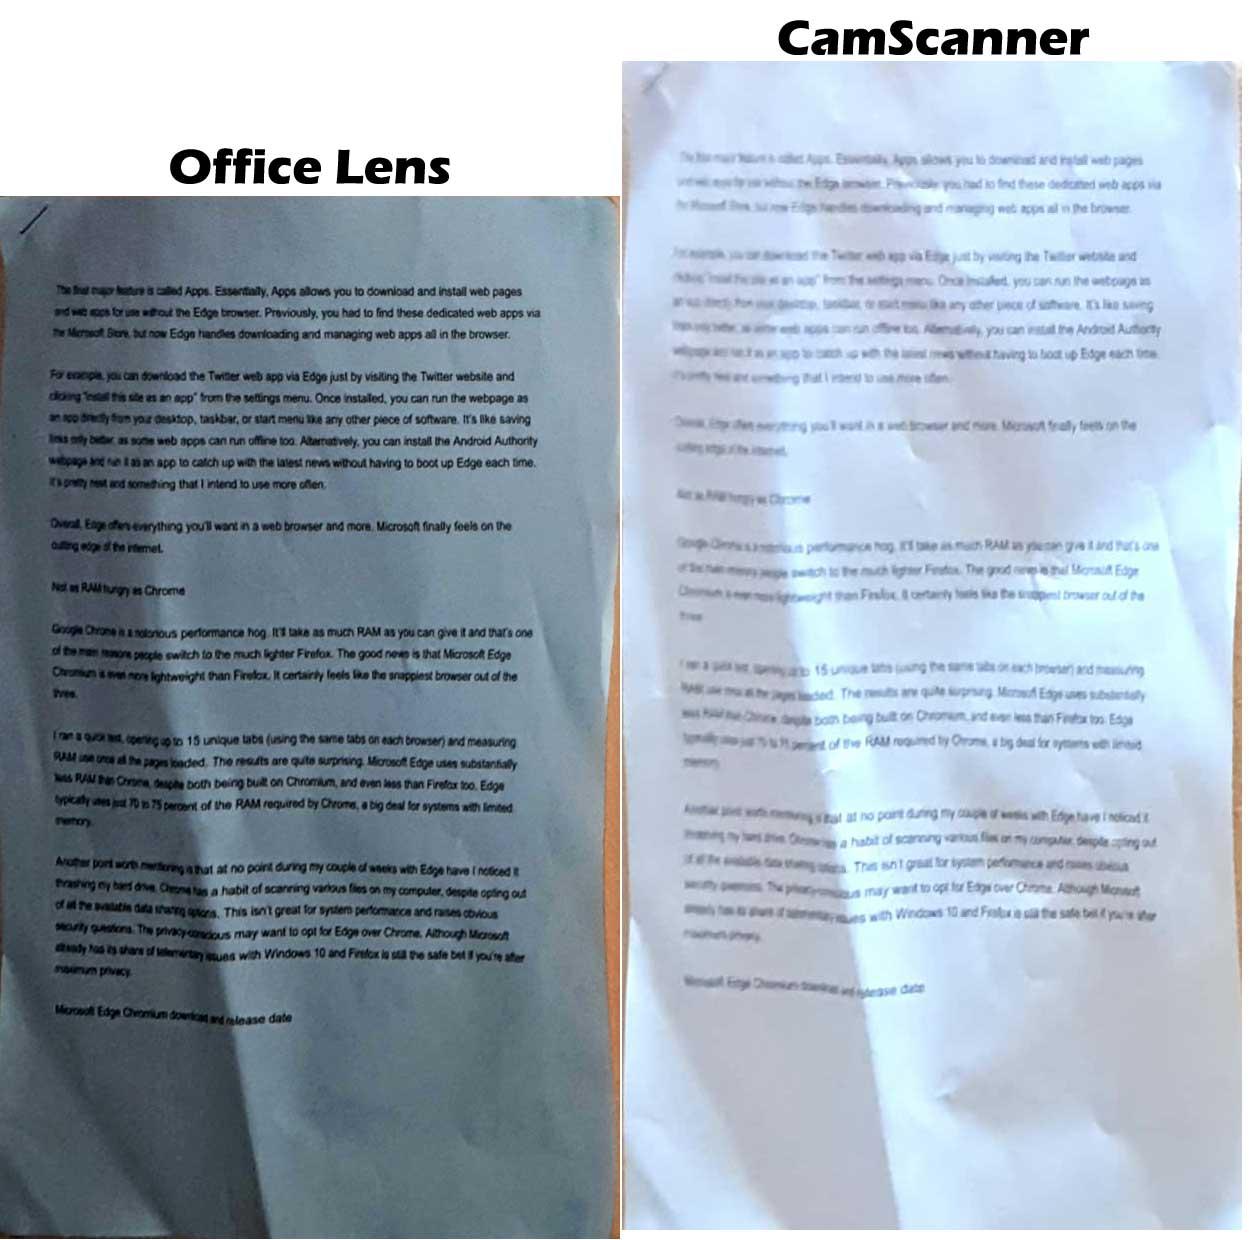 Angle Capture - Office Lens vs CamScanner